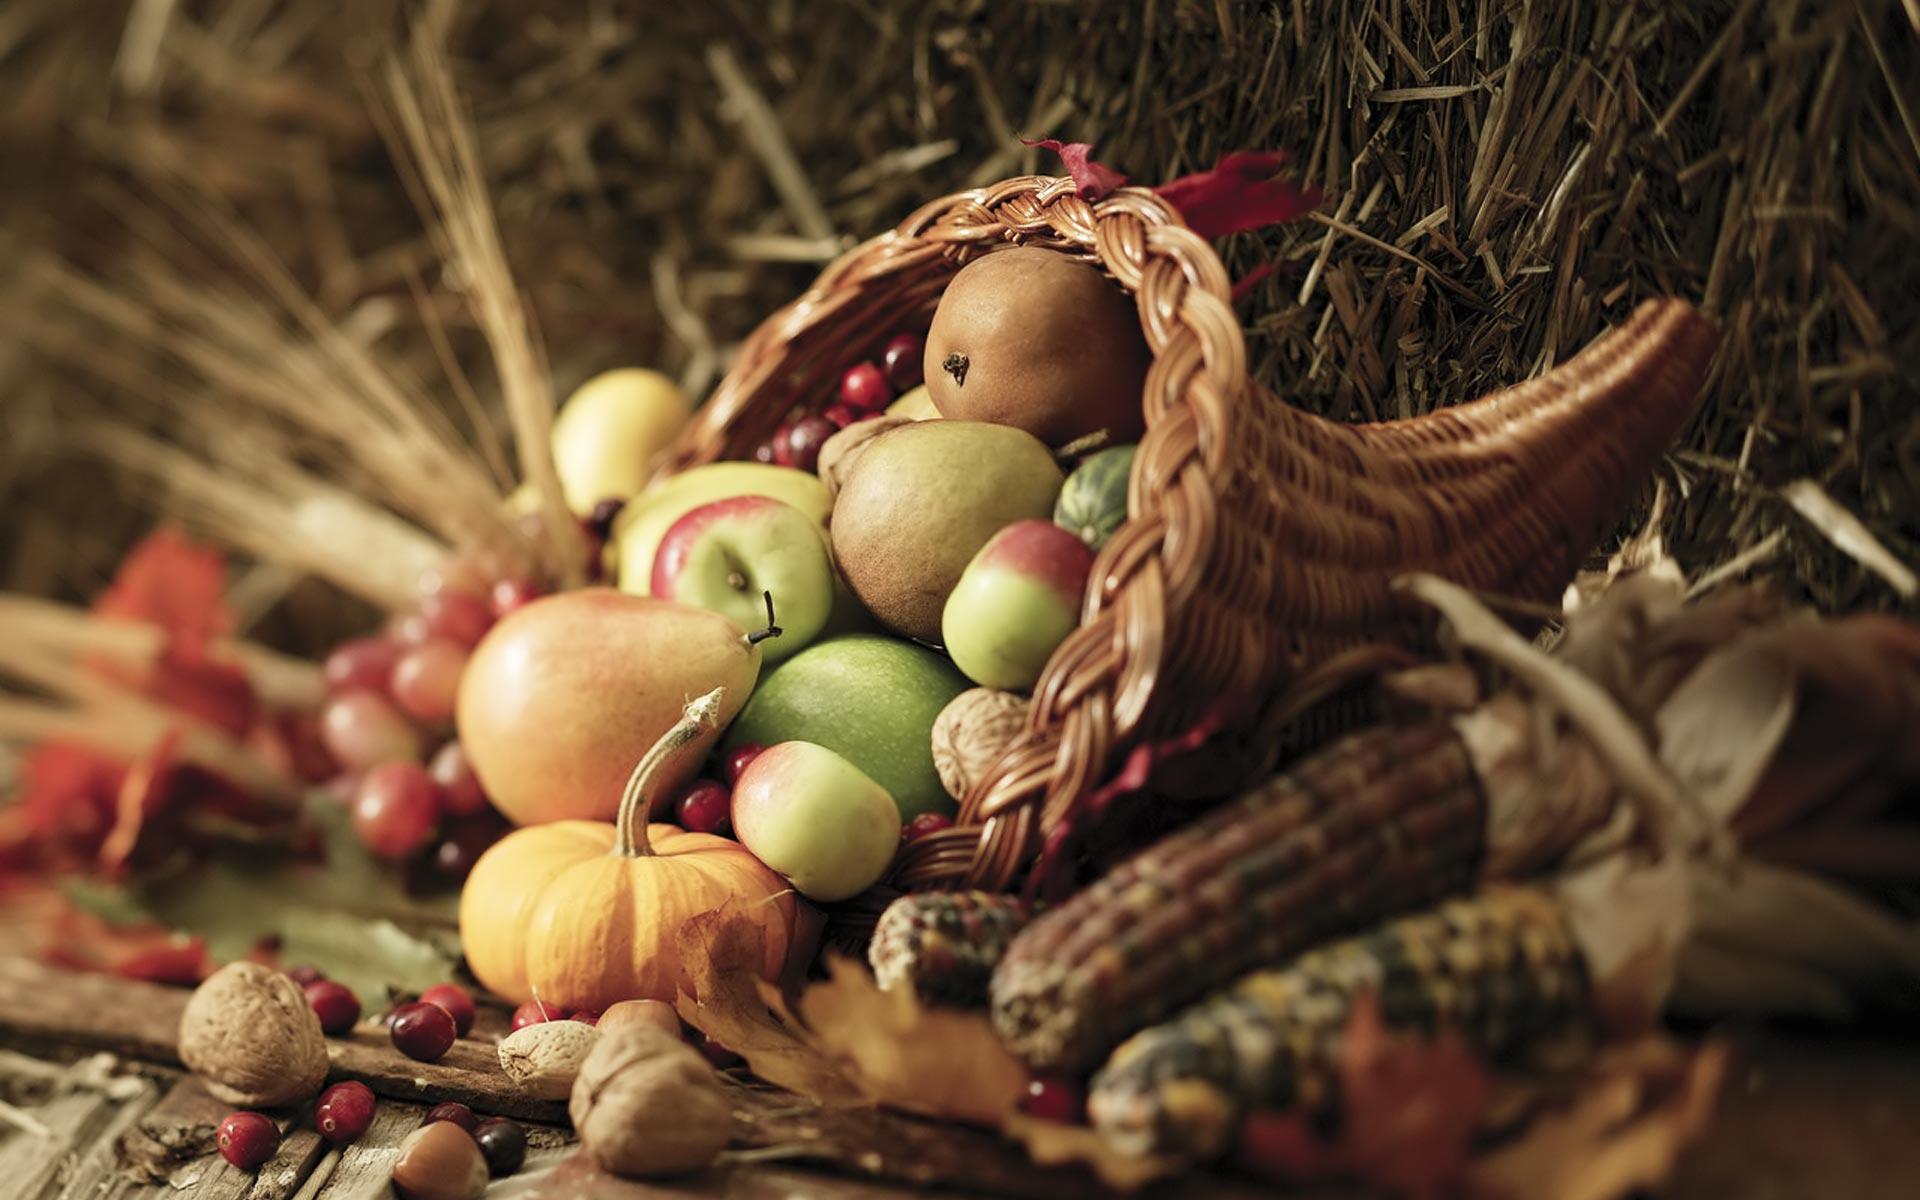 Animated Thanksgiving Desktop Backgrounds Wide Photos - Thanksgiving Cornucopia Background - HD Wallpaper